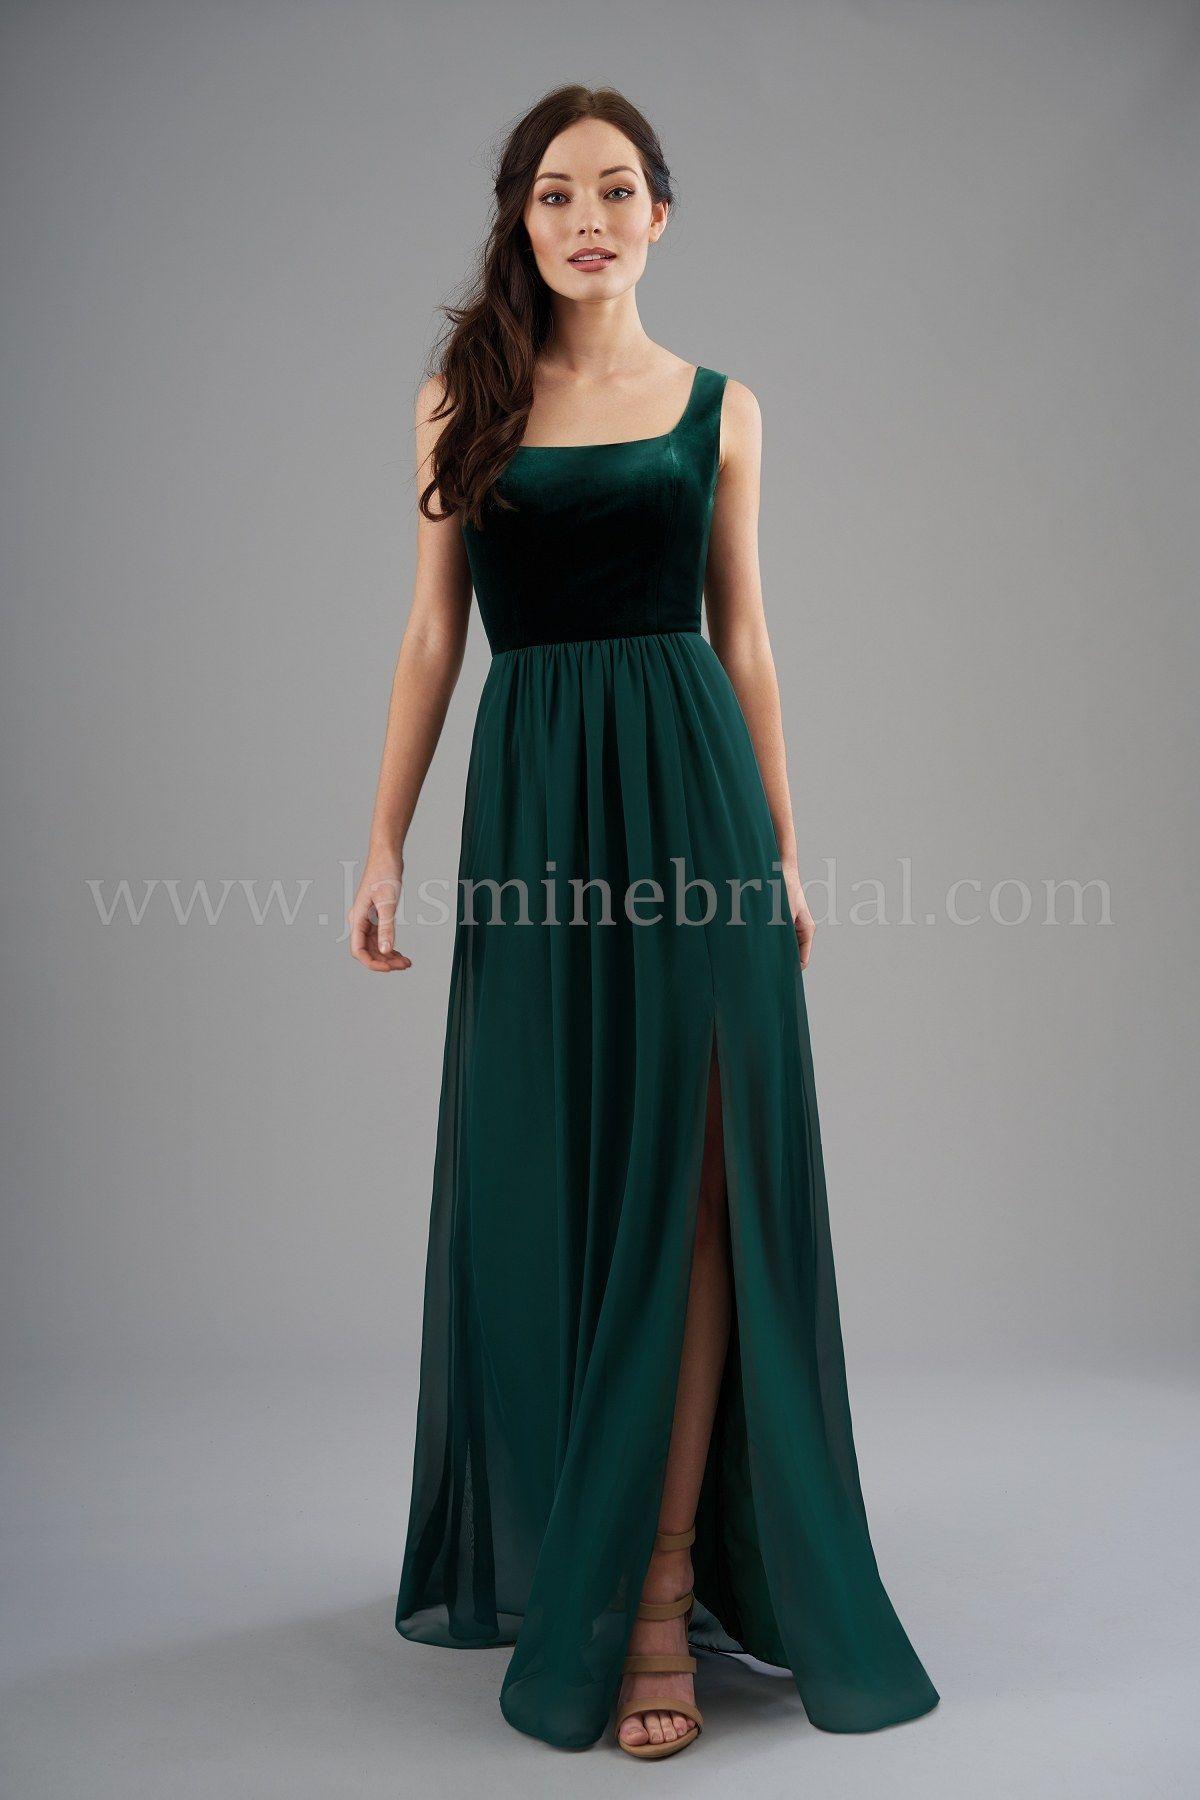 B2 Dress Style B203055 Designer Bridesmaid Dresses Bridesmaid Skirts Pretty Bridesmaid Dresses